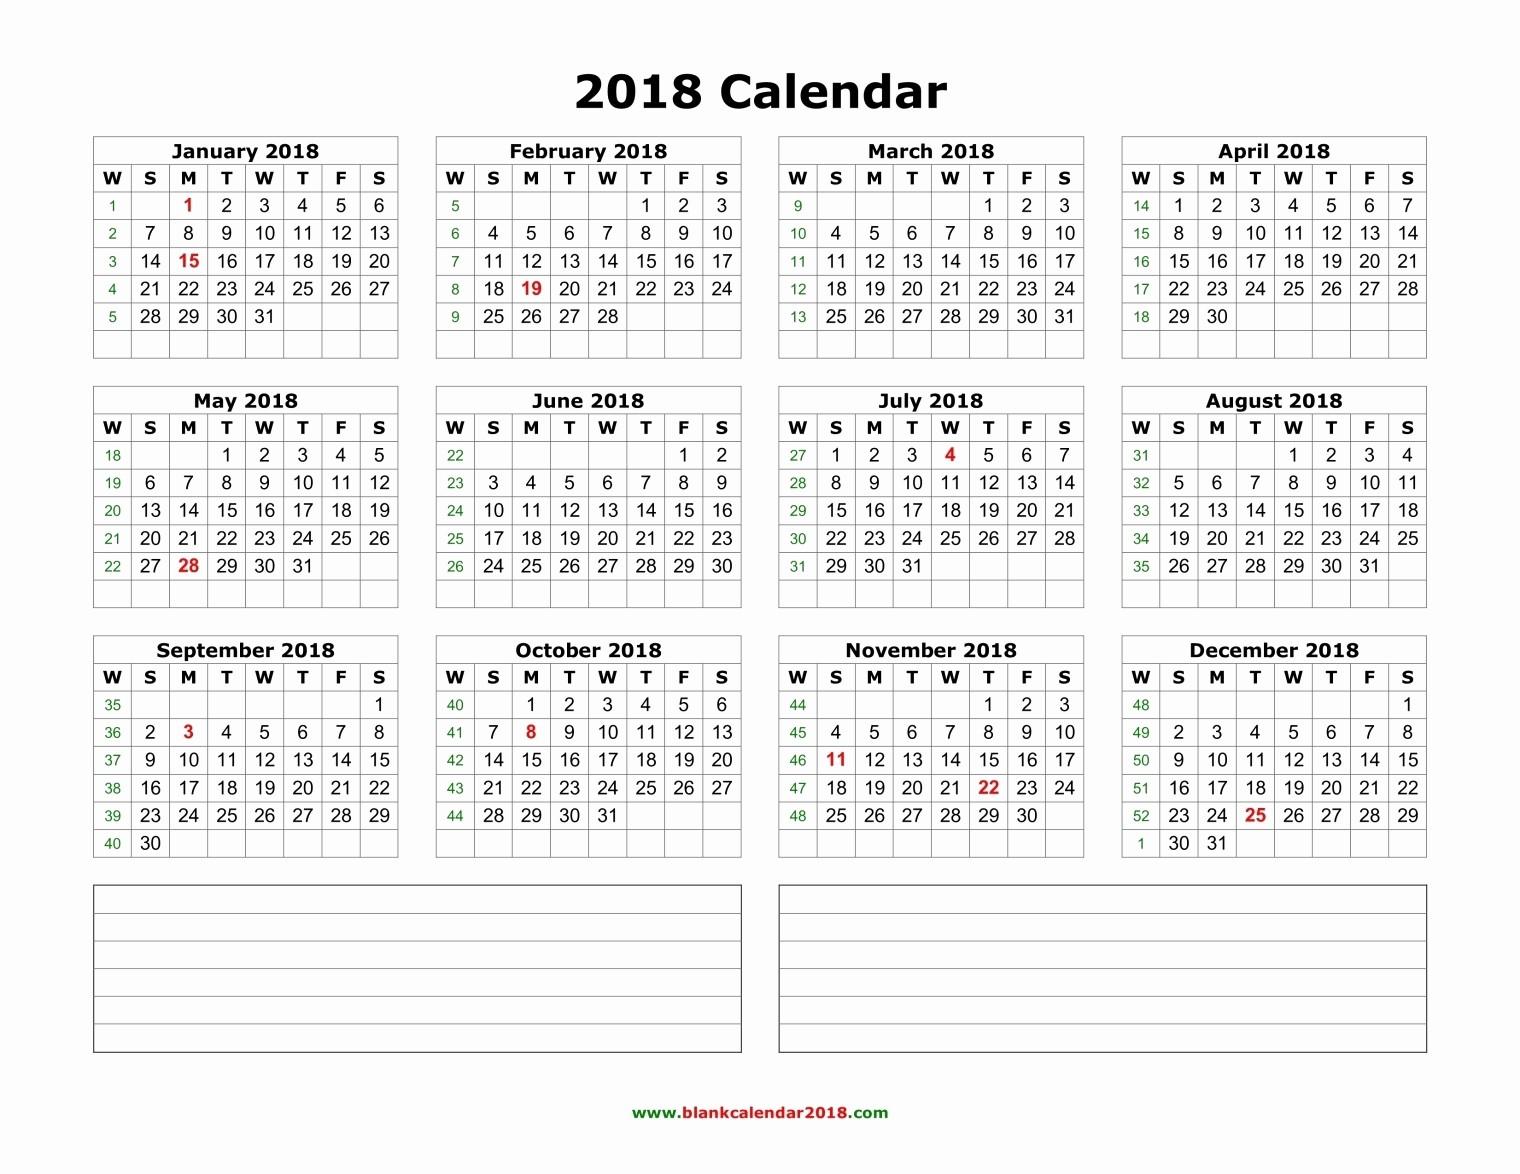 Printable Calendar December 2018 Landscape Unique Blank Calendar 2018 with Notes Landscape